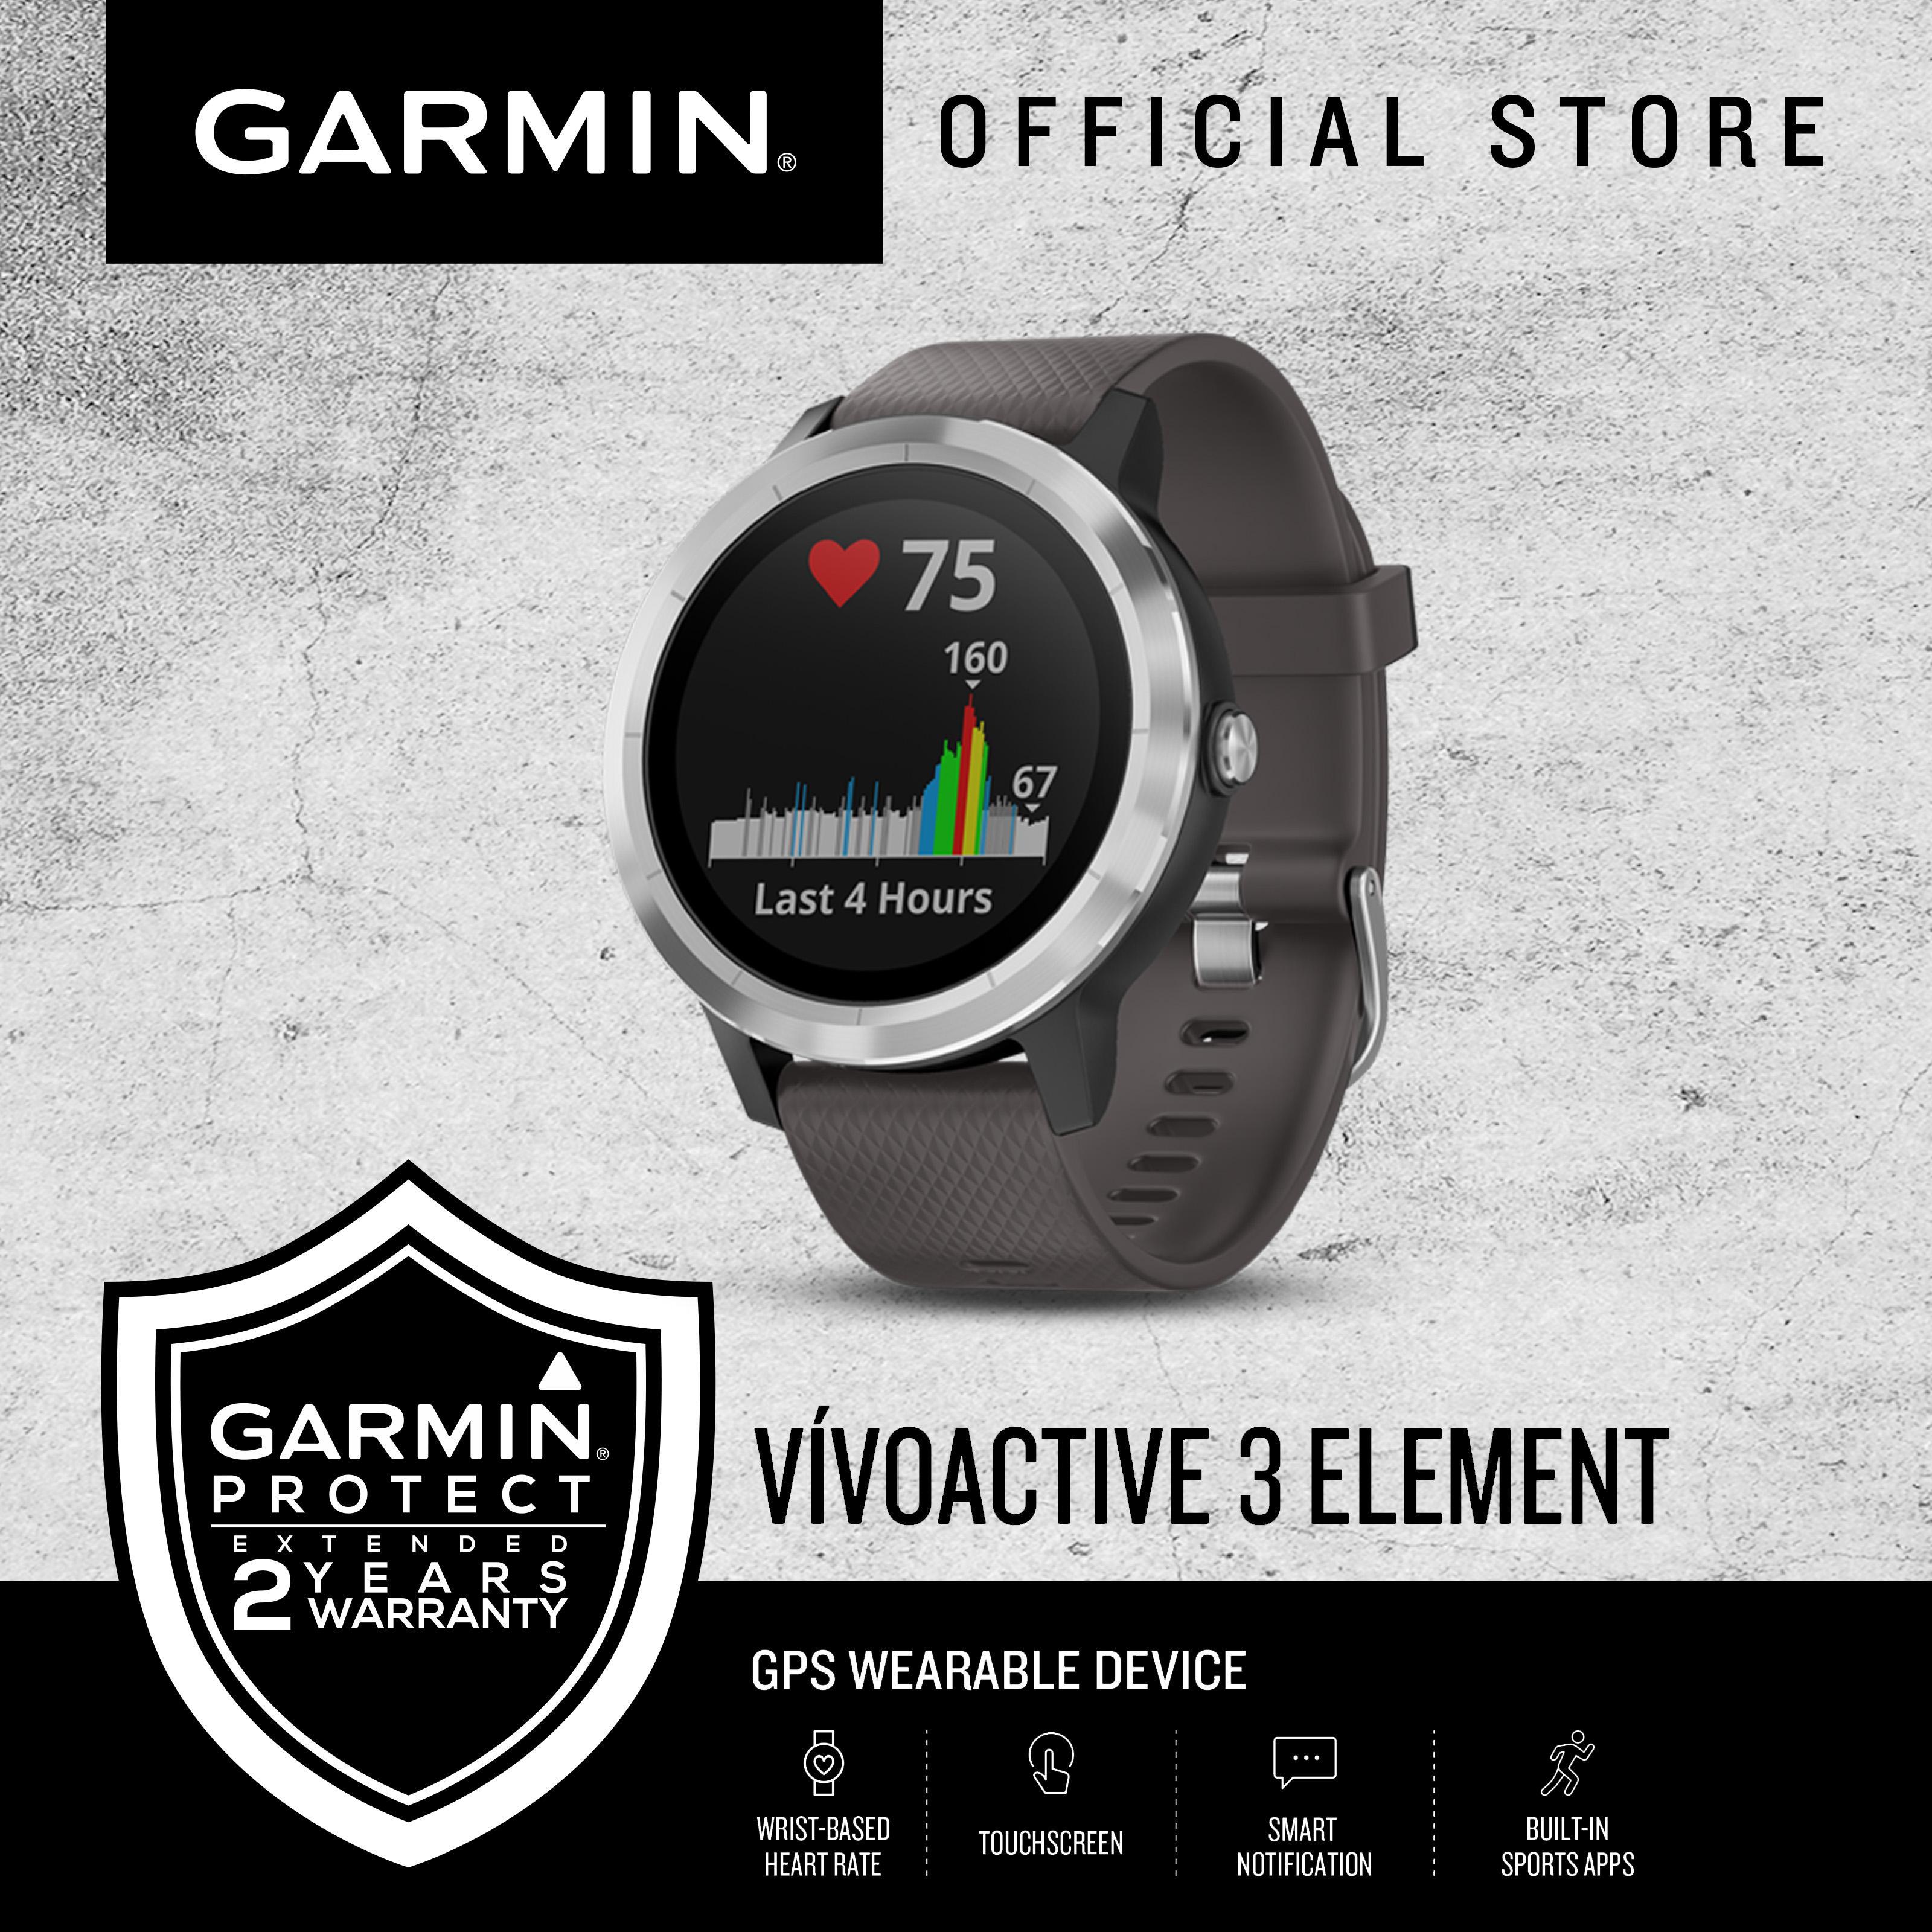 Garmin vívoactive® 3 Element (Grey) GPS Smartwatch with 2 Years Warranty